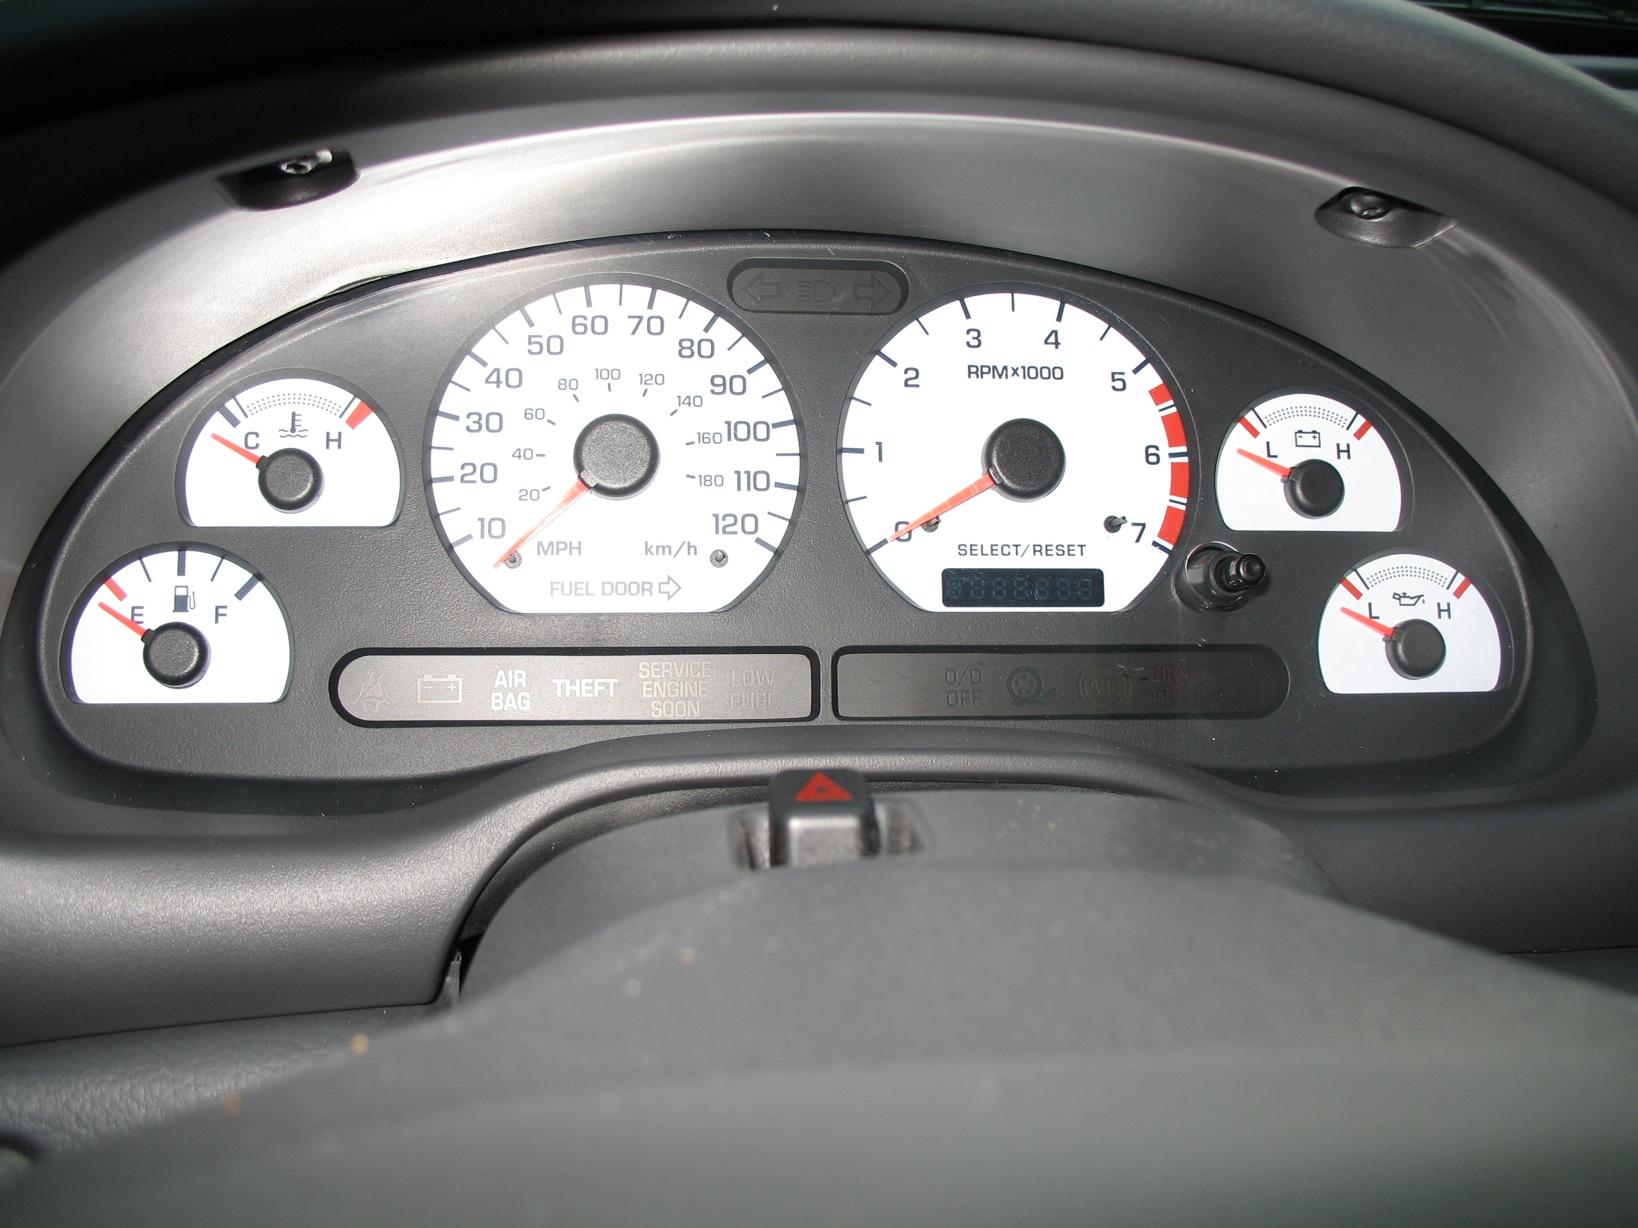 1994 1995 Mustang 3 8l White Face Gauge Kit W 120mph Sdo Larger Image